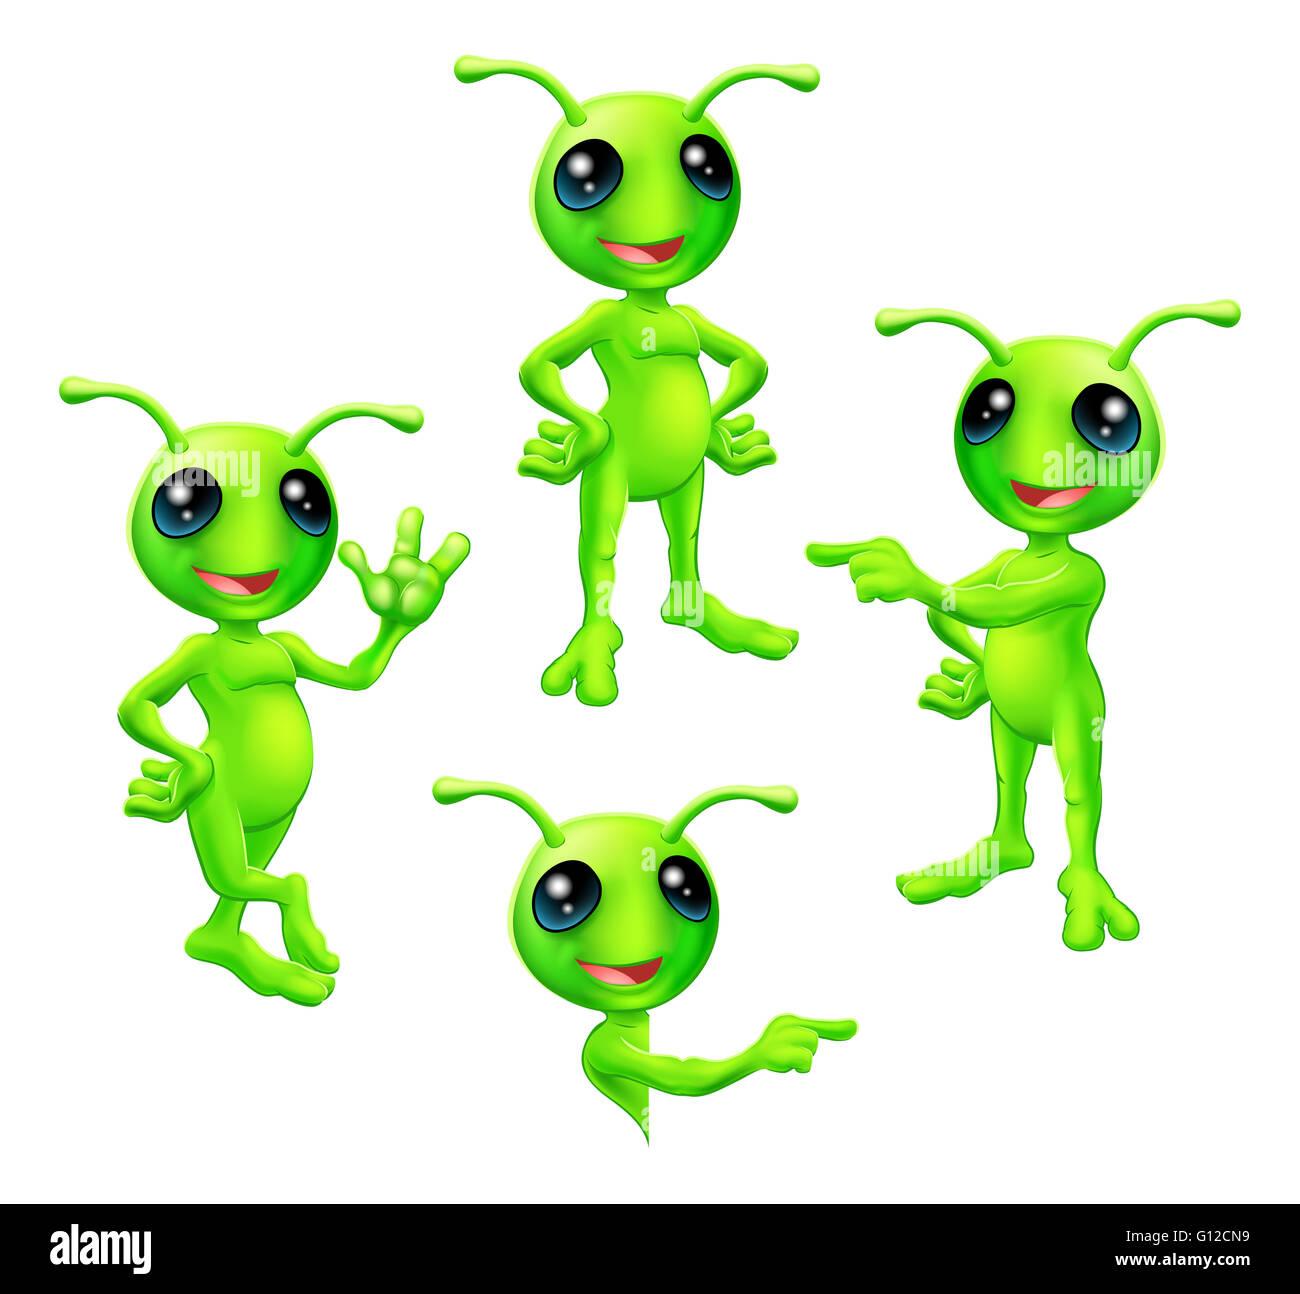 a cute cartoon green alien martian character with antennae in